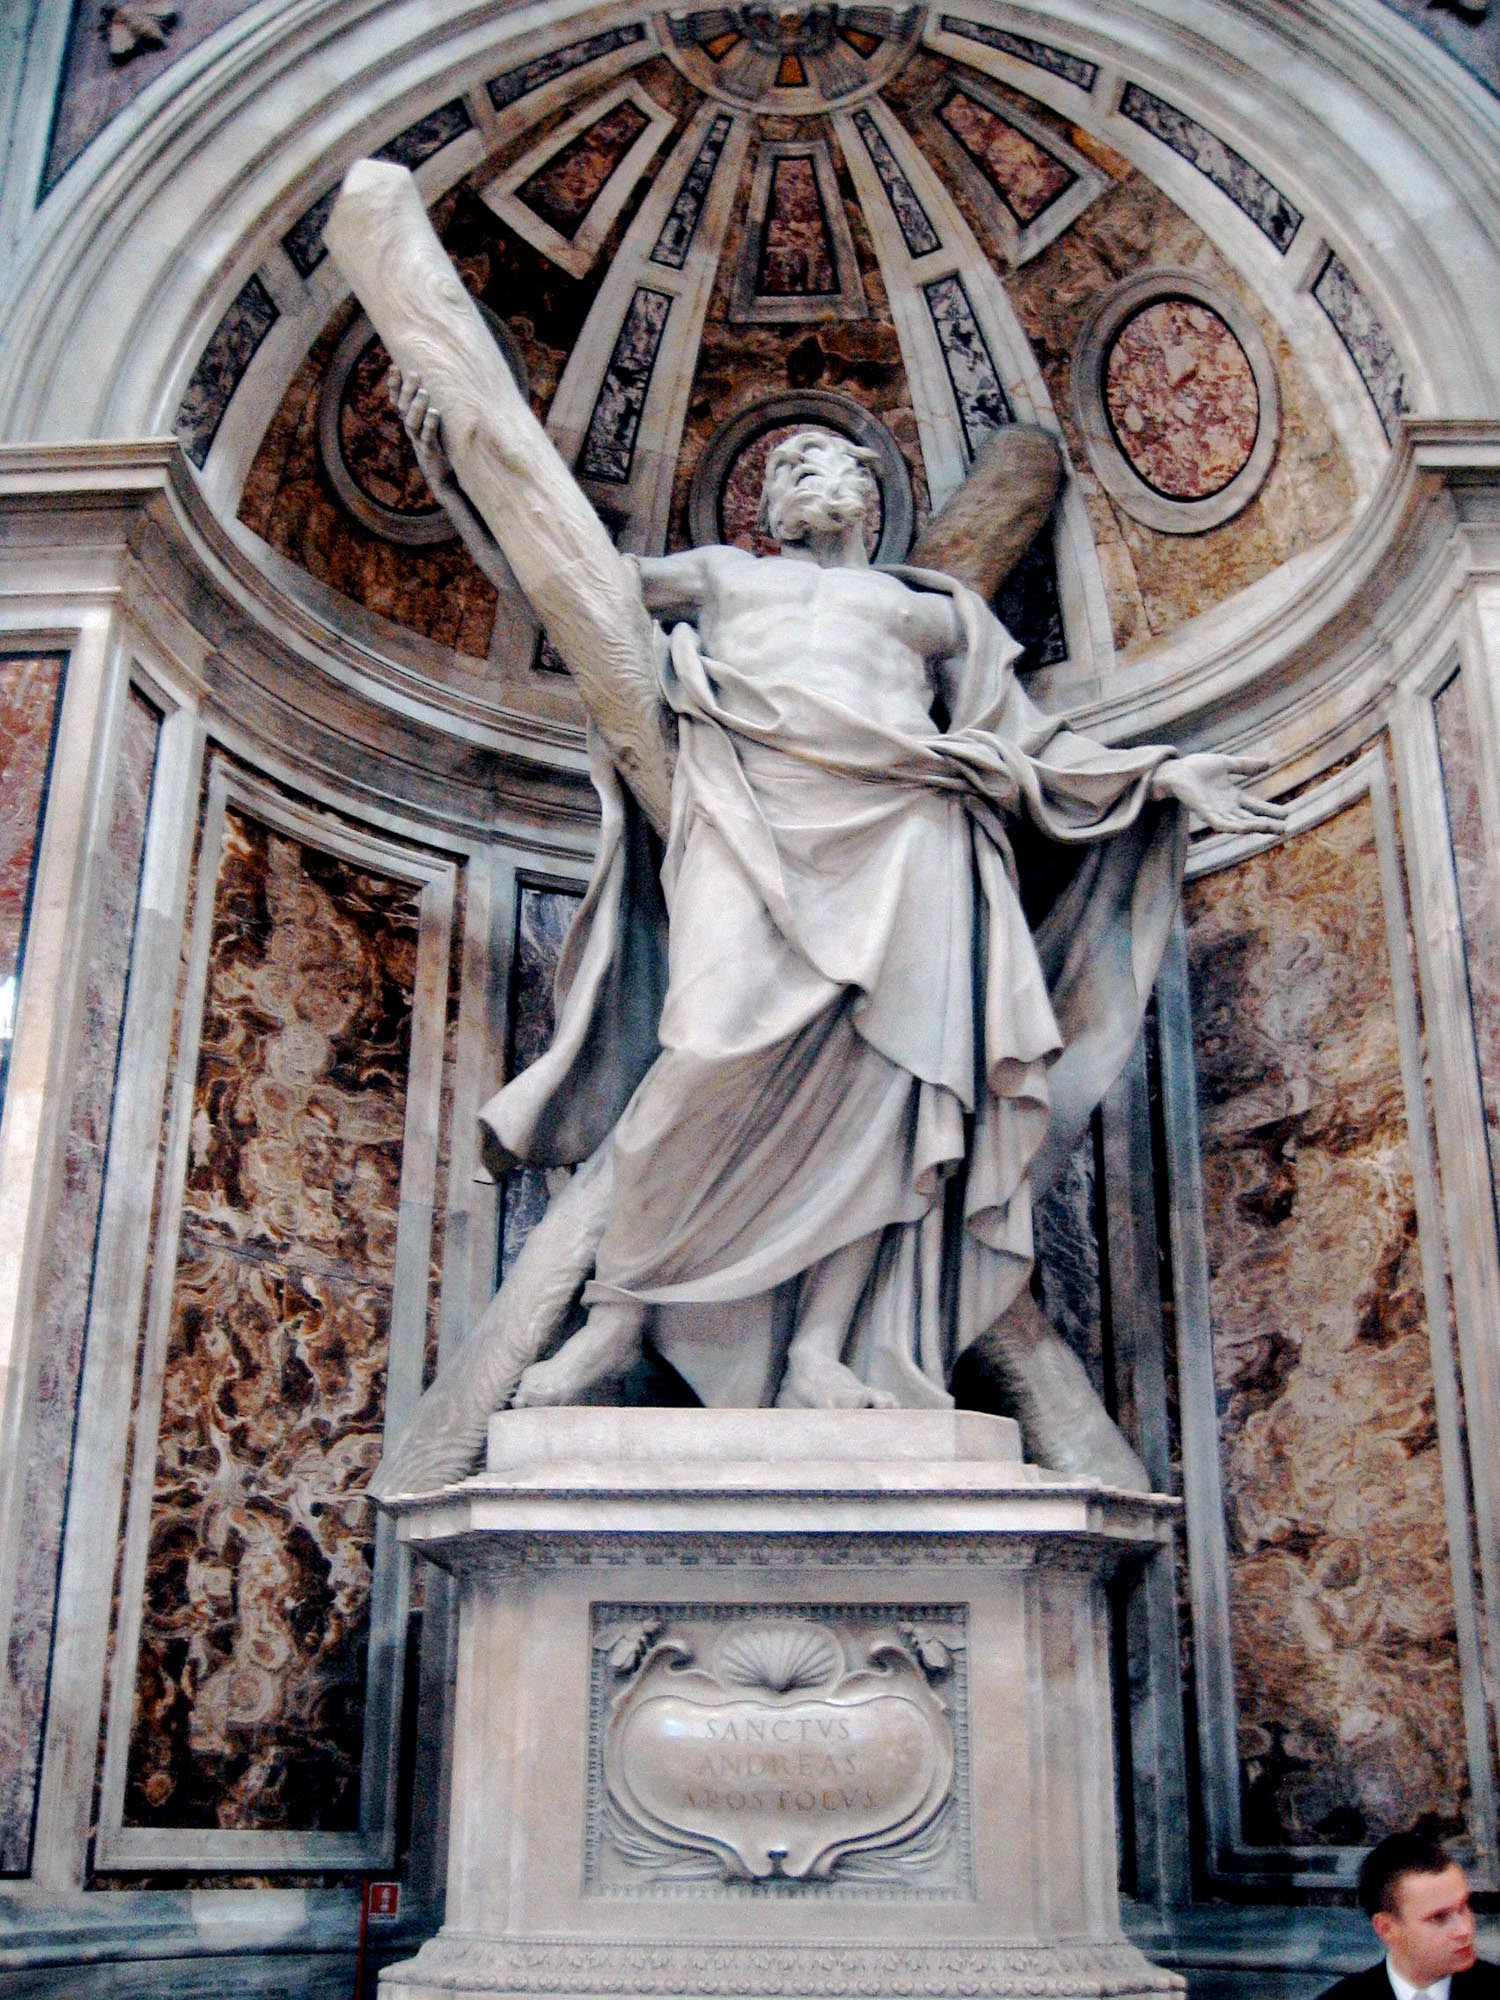 statue St. Andrew Apostle cross St. Peter's basilica rome vatican john chrysostom